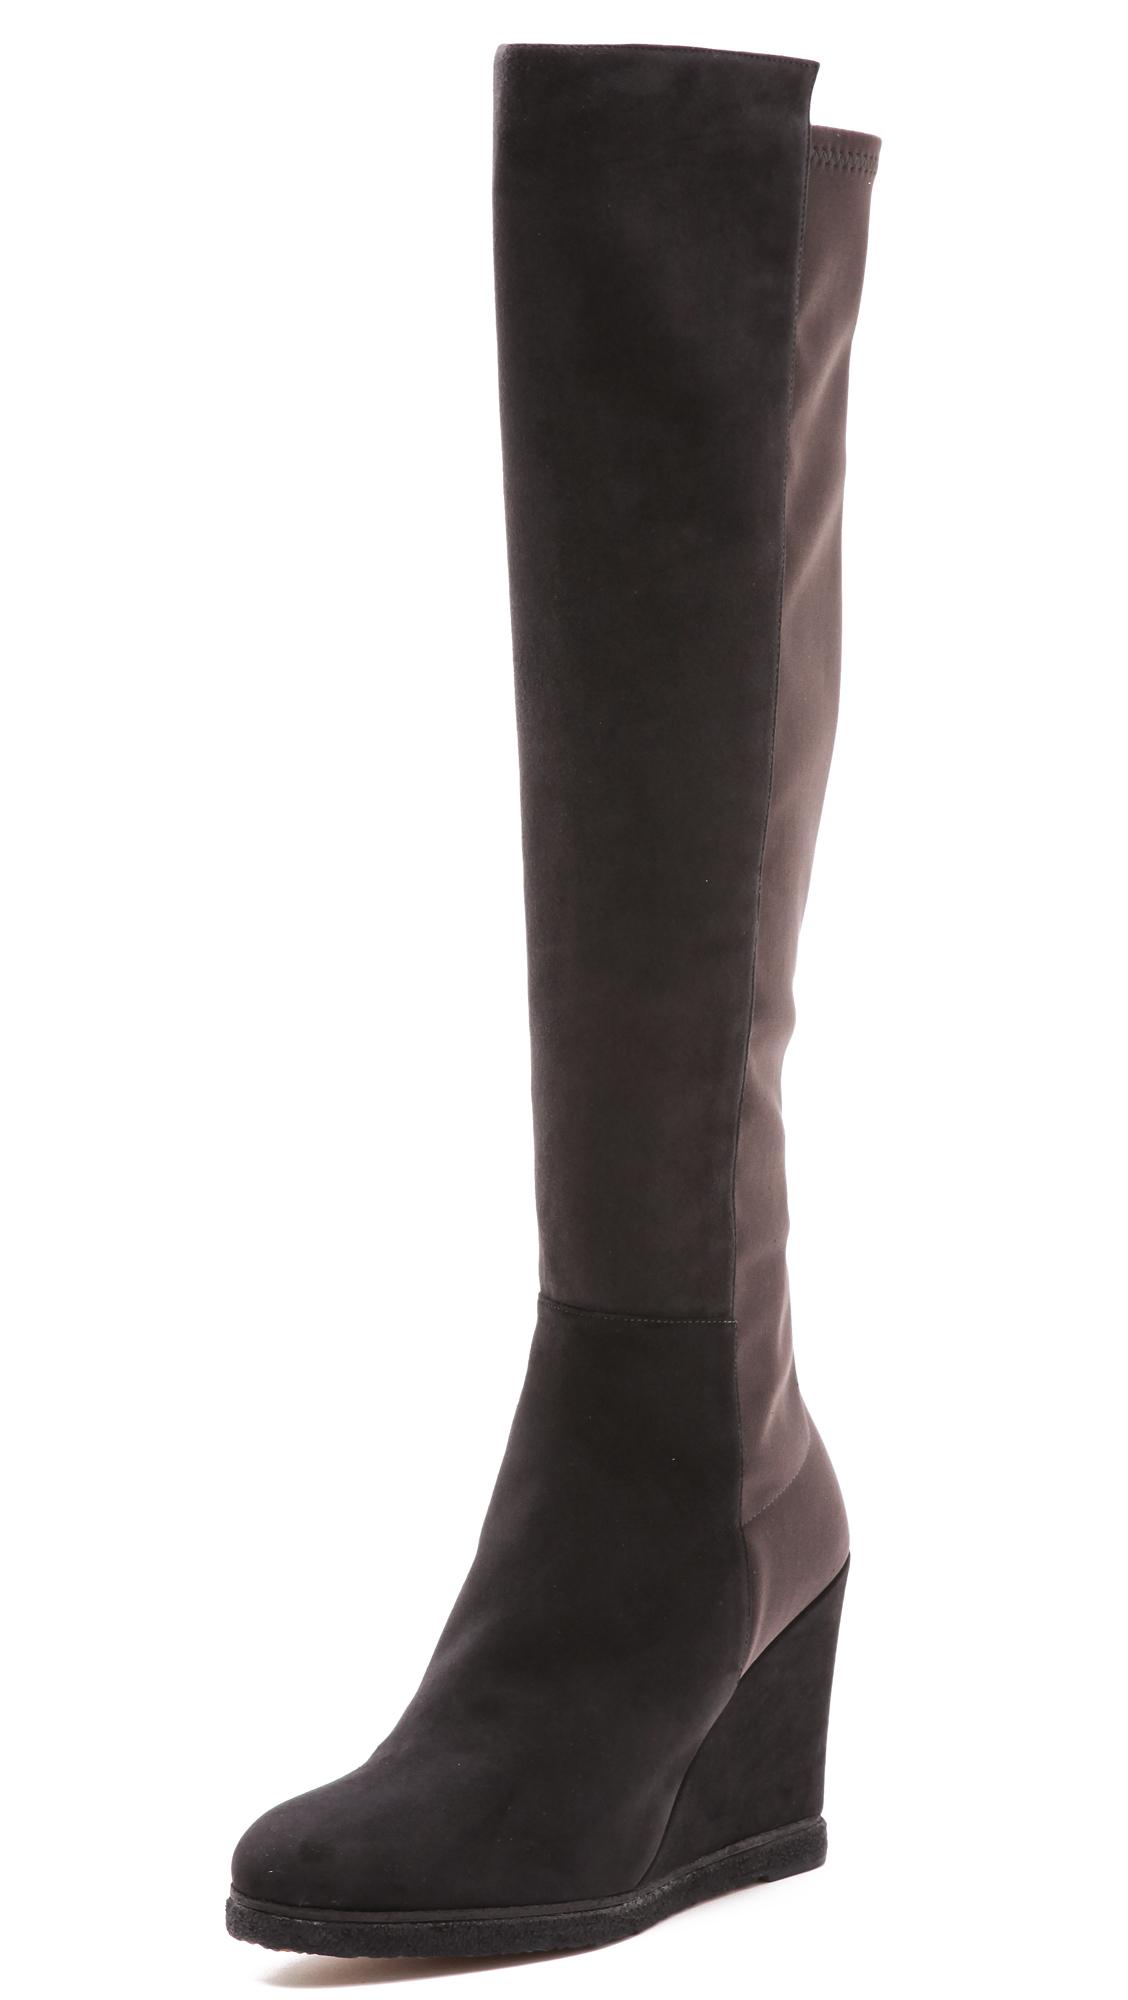 68a8d3d5725 Stuart Weitzman Demiswoon Suede Wedge Boots